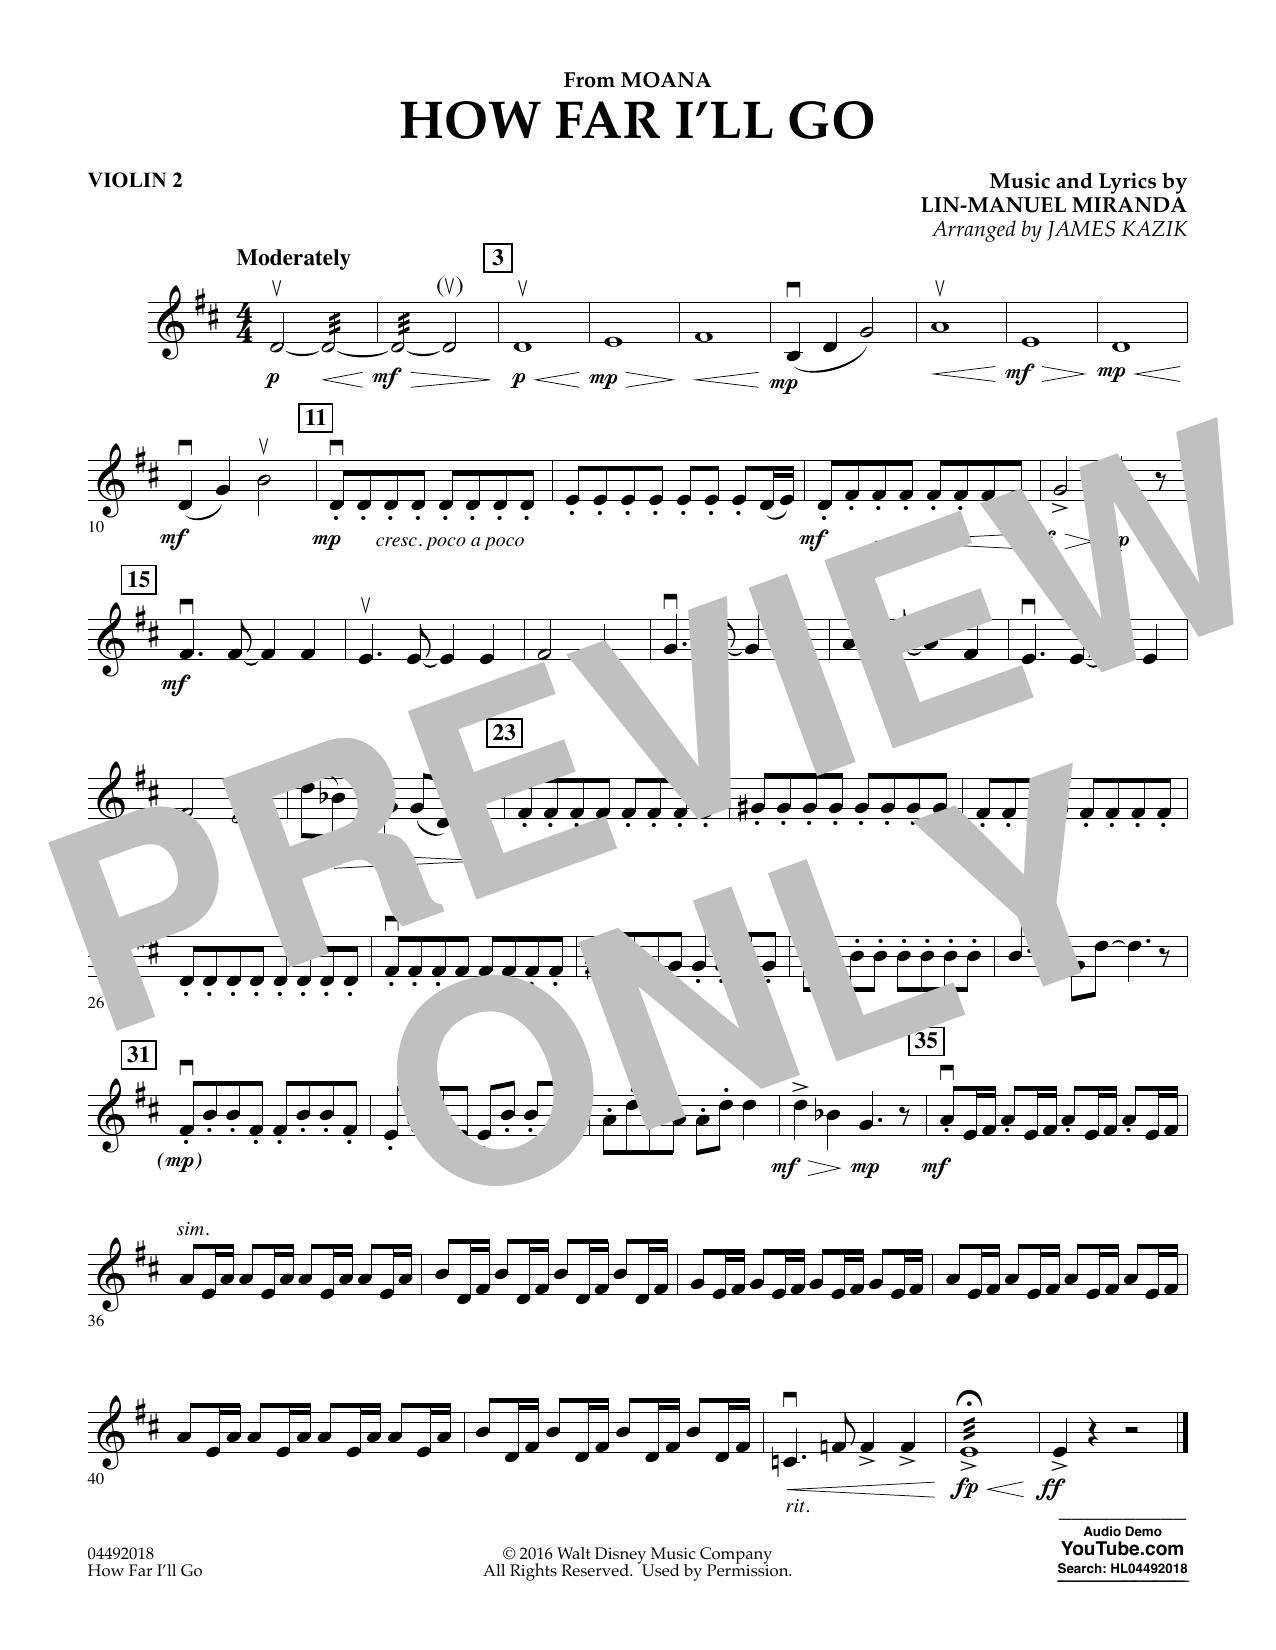 James Kazik How Far I'll Go (from Moana) - Violin 2 sheet music notes and chords. Download Printable PDF.